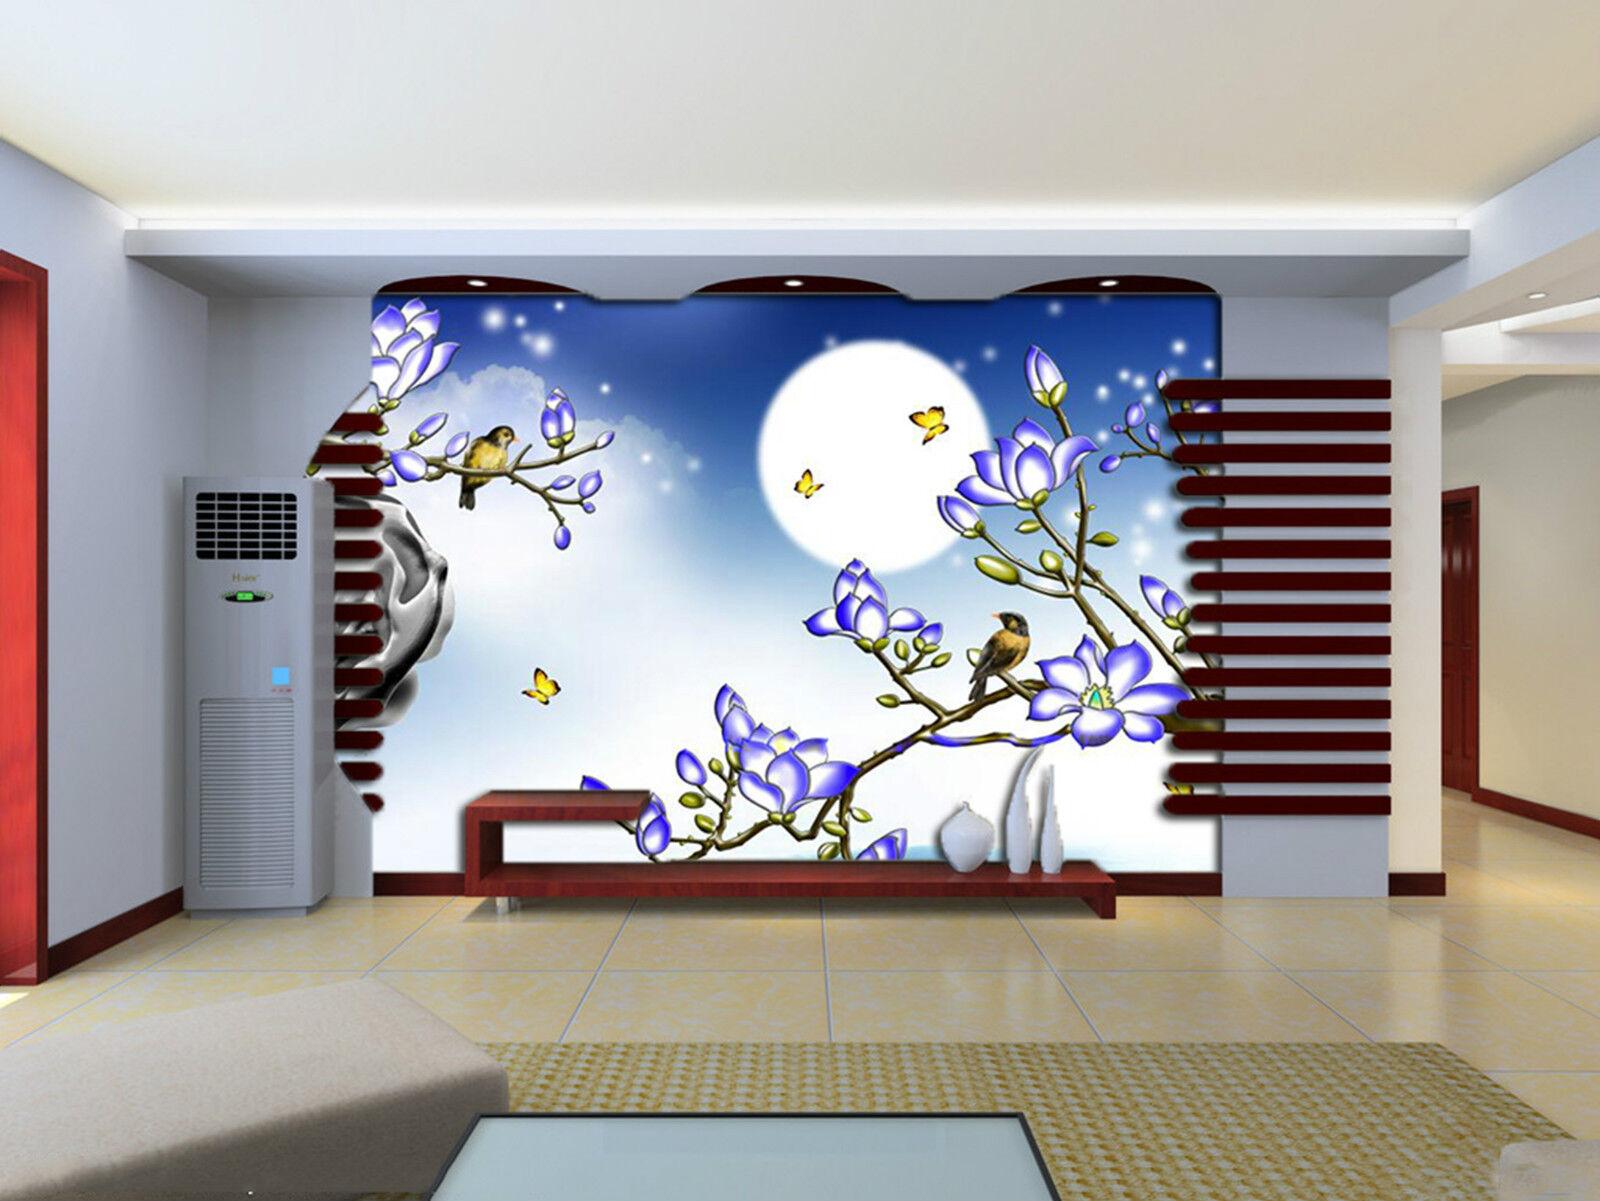 3D Hell Mond 827  Fototapeten Wandbild Fototapete Bild Tapete Familie Kinder DE